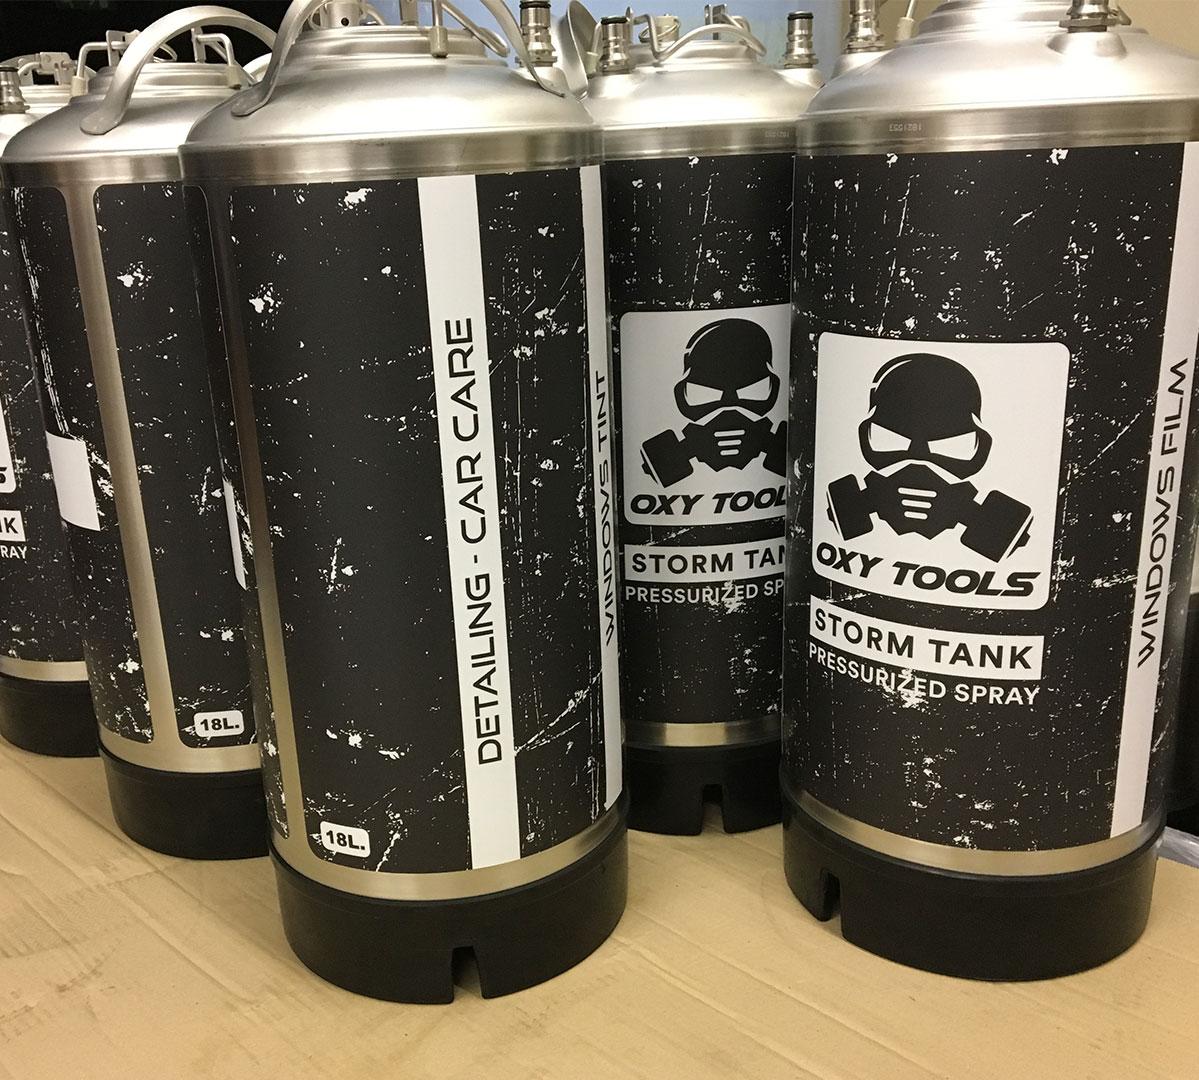 storm-tank-oxytools-foto-gallery-3